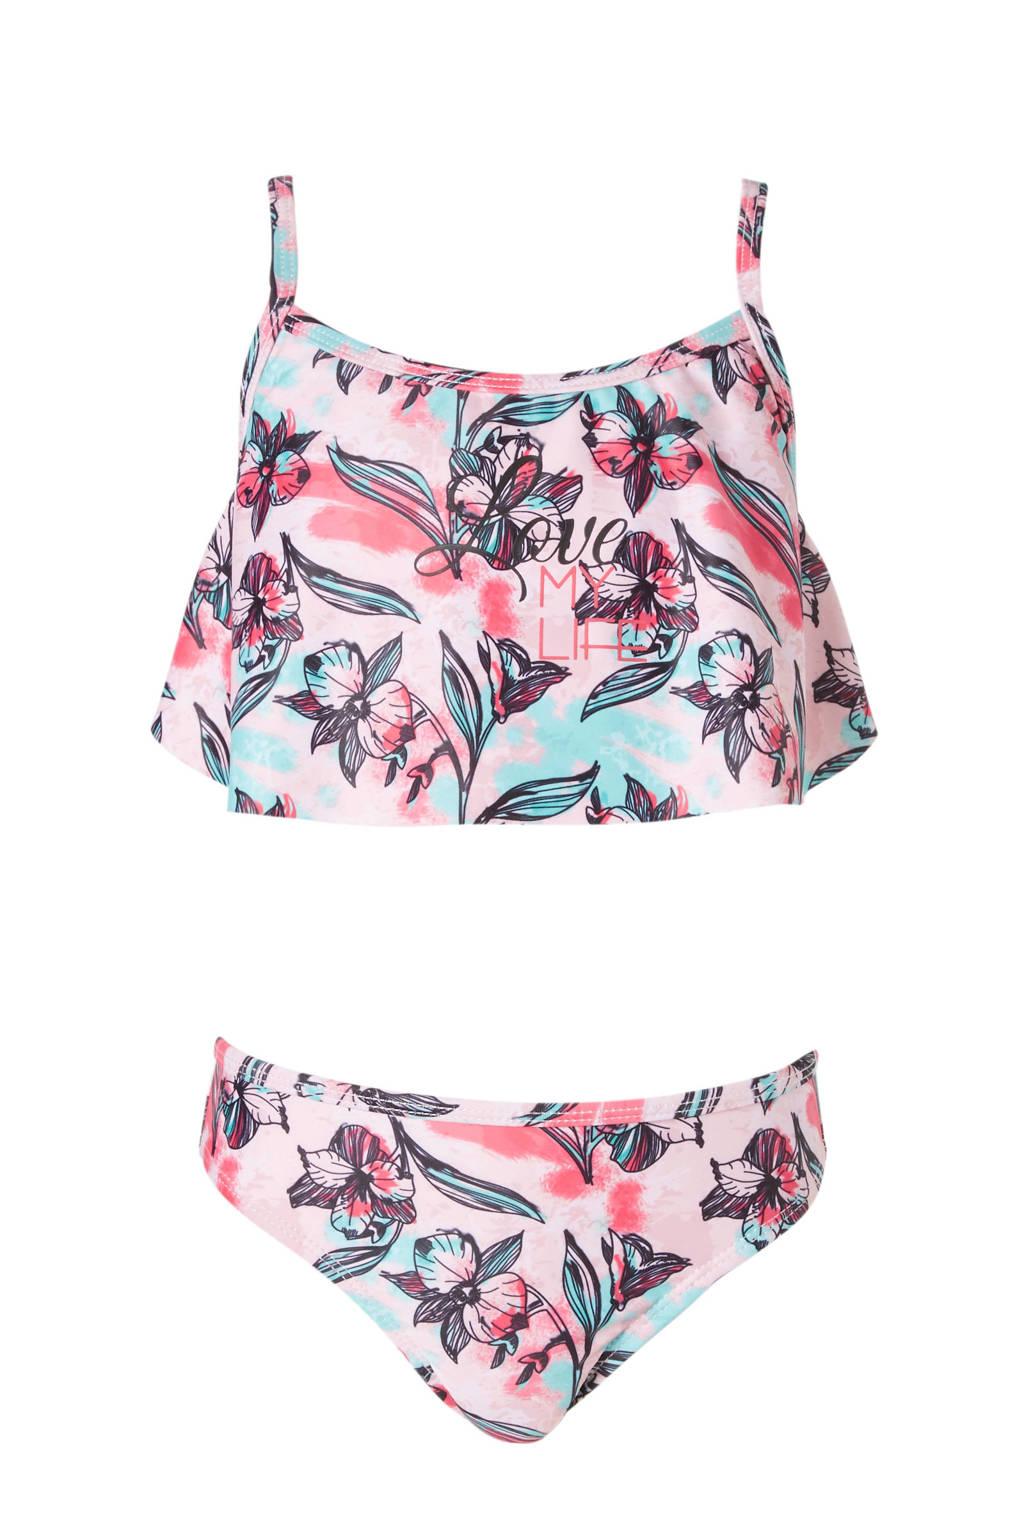 DJ Dutchjeans bikini in all over print zwart, Roze/zwart/mintgroen